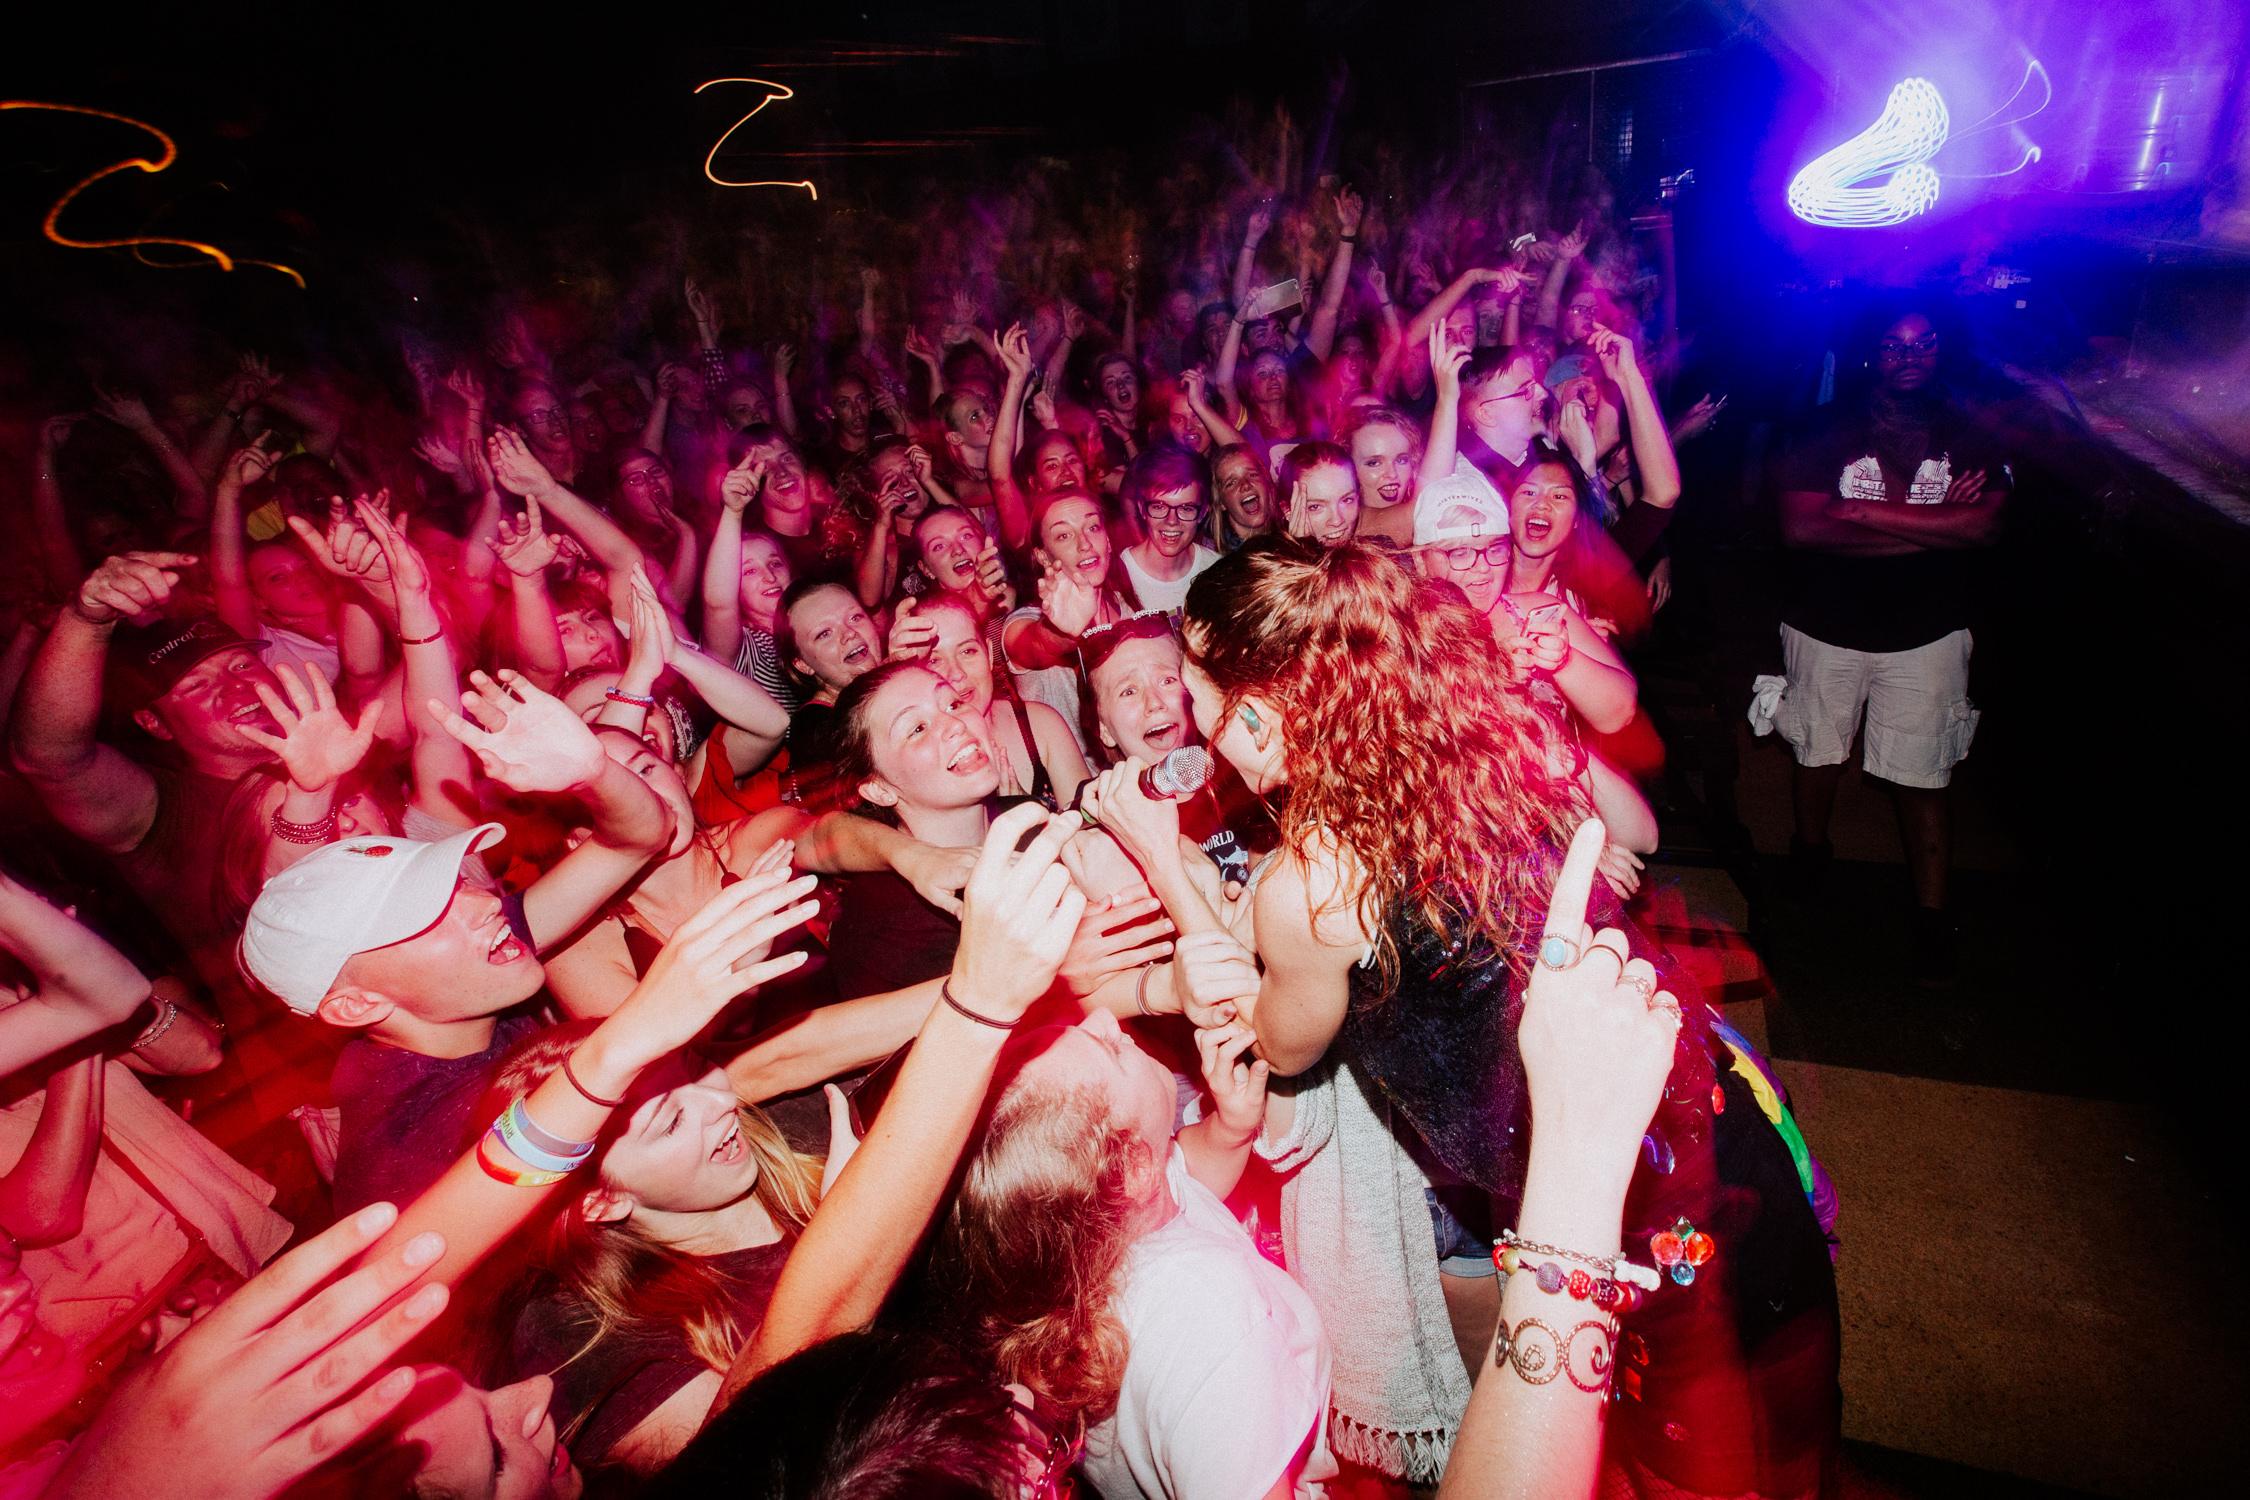 mandy-misterwives-concert-fans-front-row-tour-AnnaLeeMedia